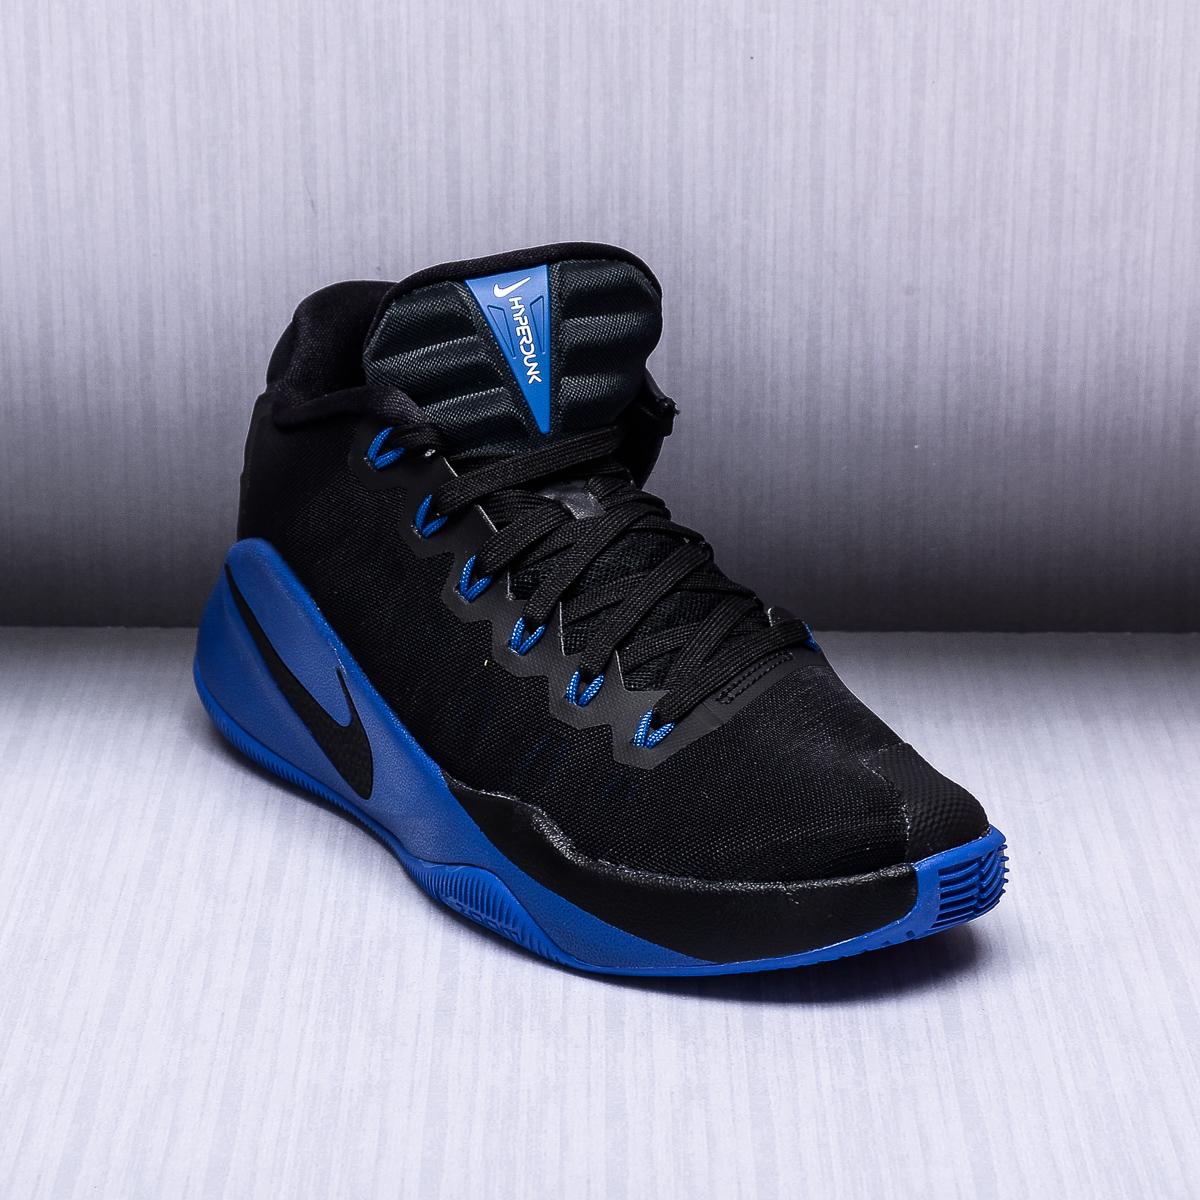 nike basketball shoes 2015 low cut buy nike studs